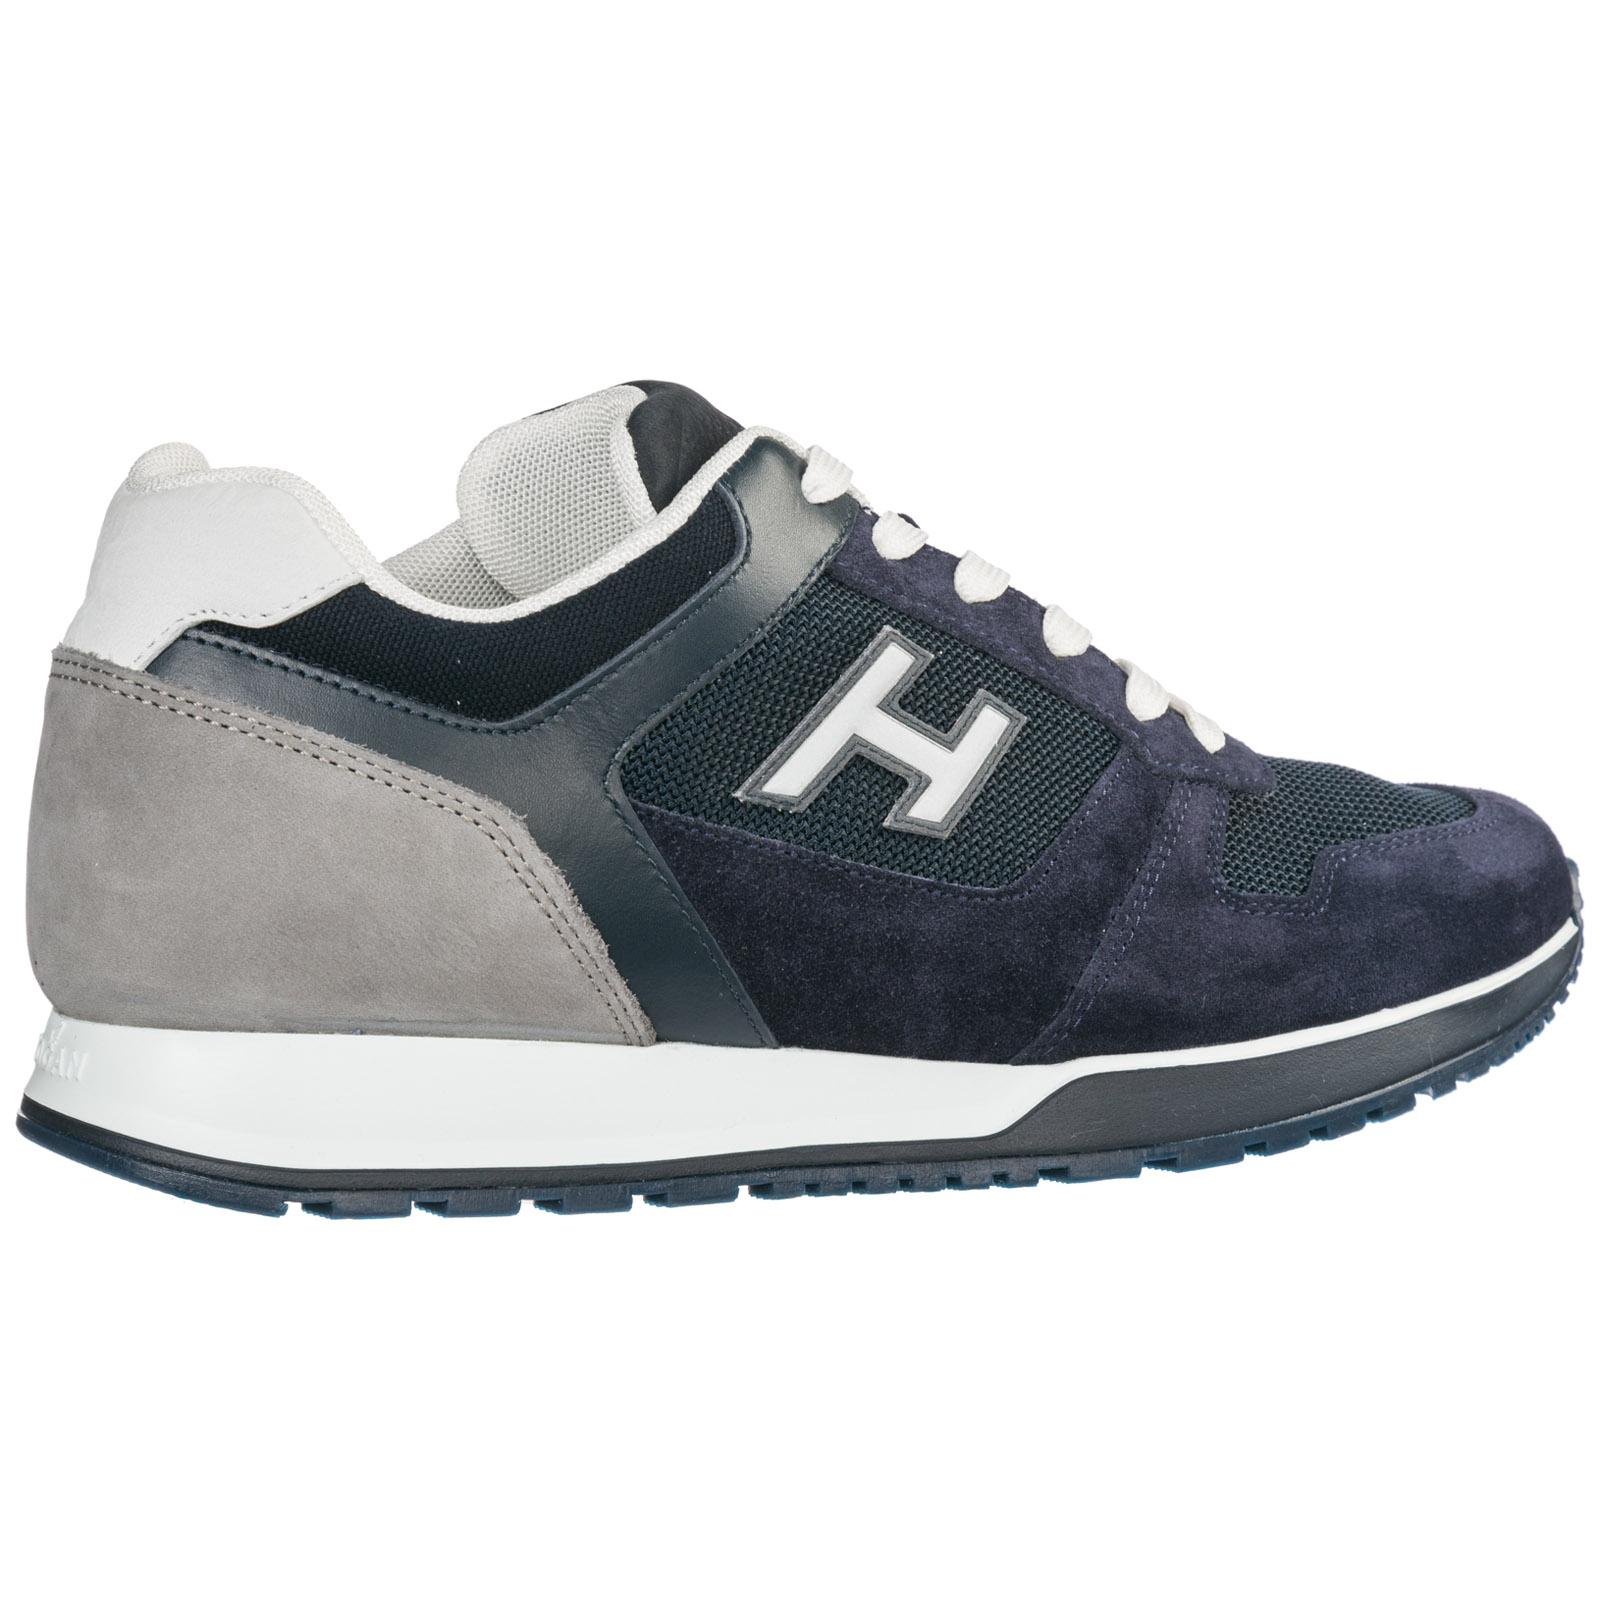 acheter populaire a00dd 18588 Chaussures baskets sneakers homme en daim h321